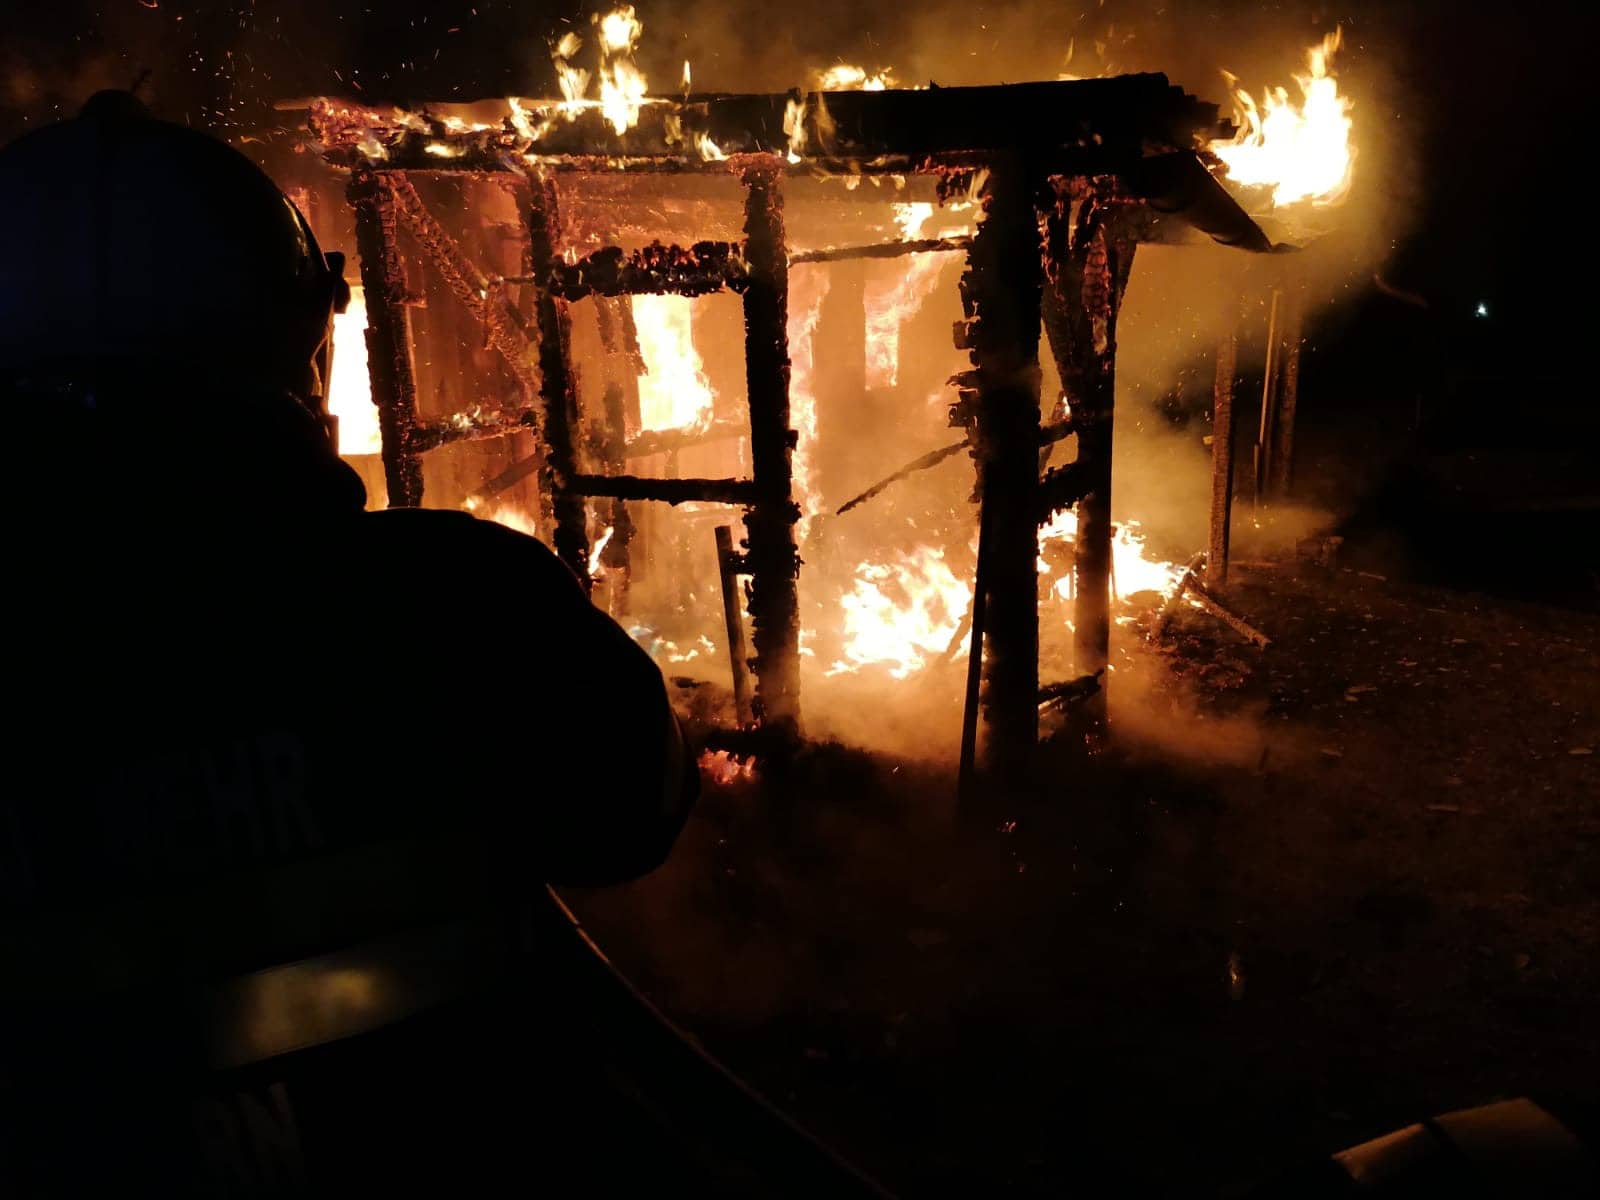 Hüttenbrand in Öblarn Ortsteil Bach